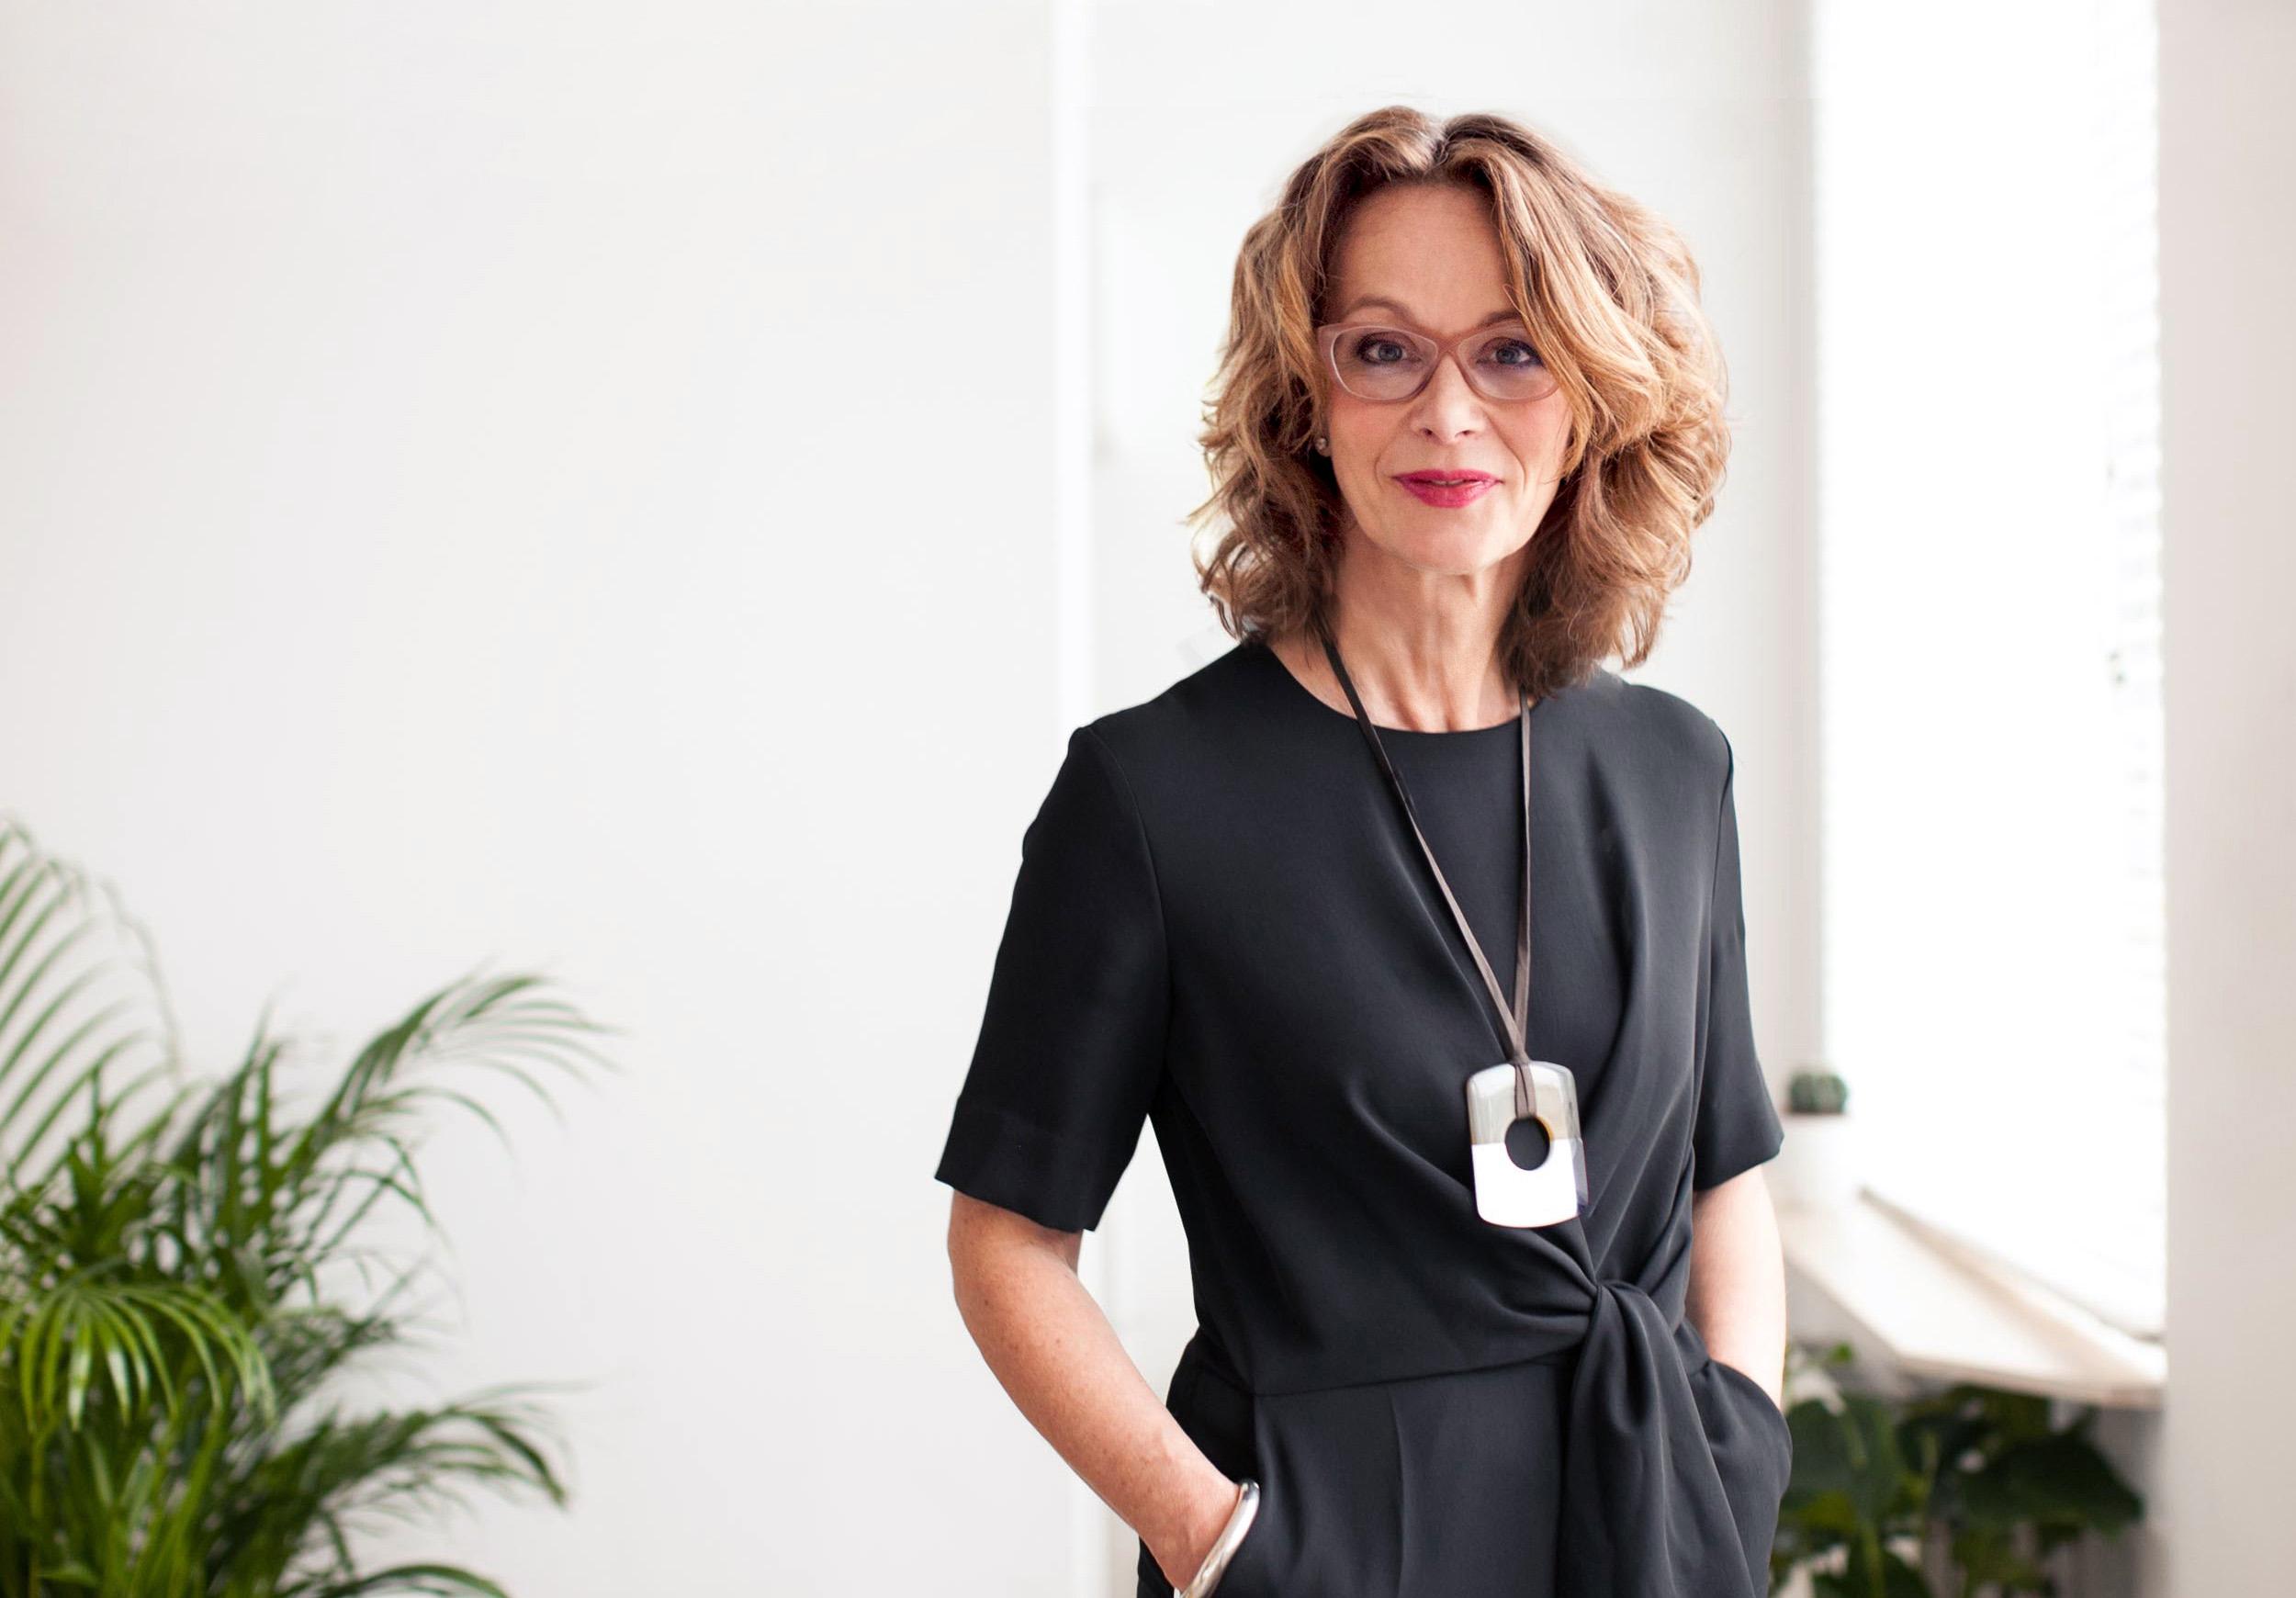 Liesbeth Dillen - Future-Proof & Maximize Your Business Potentials-2.jpg